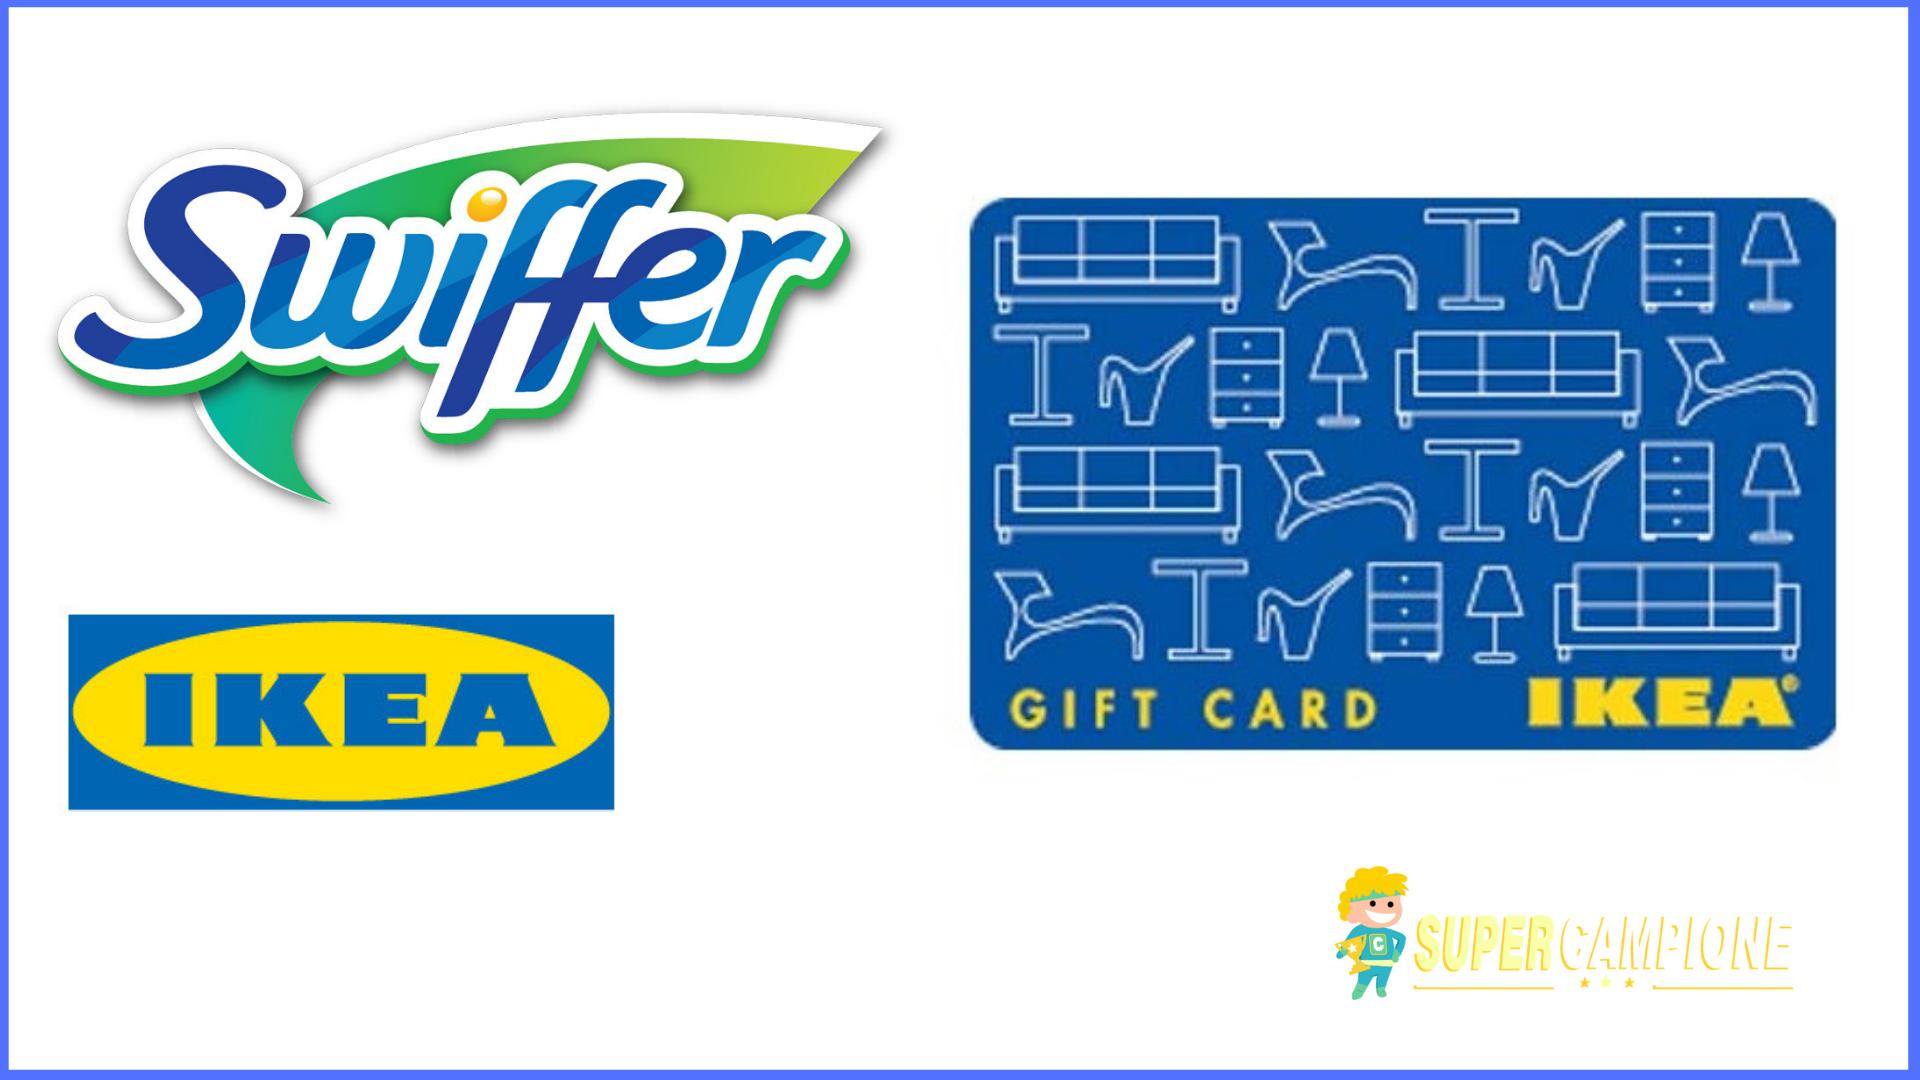 Vinci carte regalo Ikea da 100 euro con Swiffer